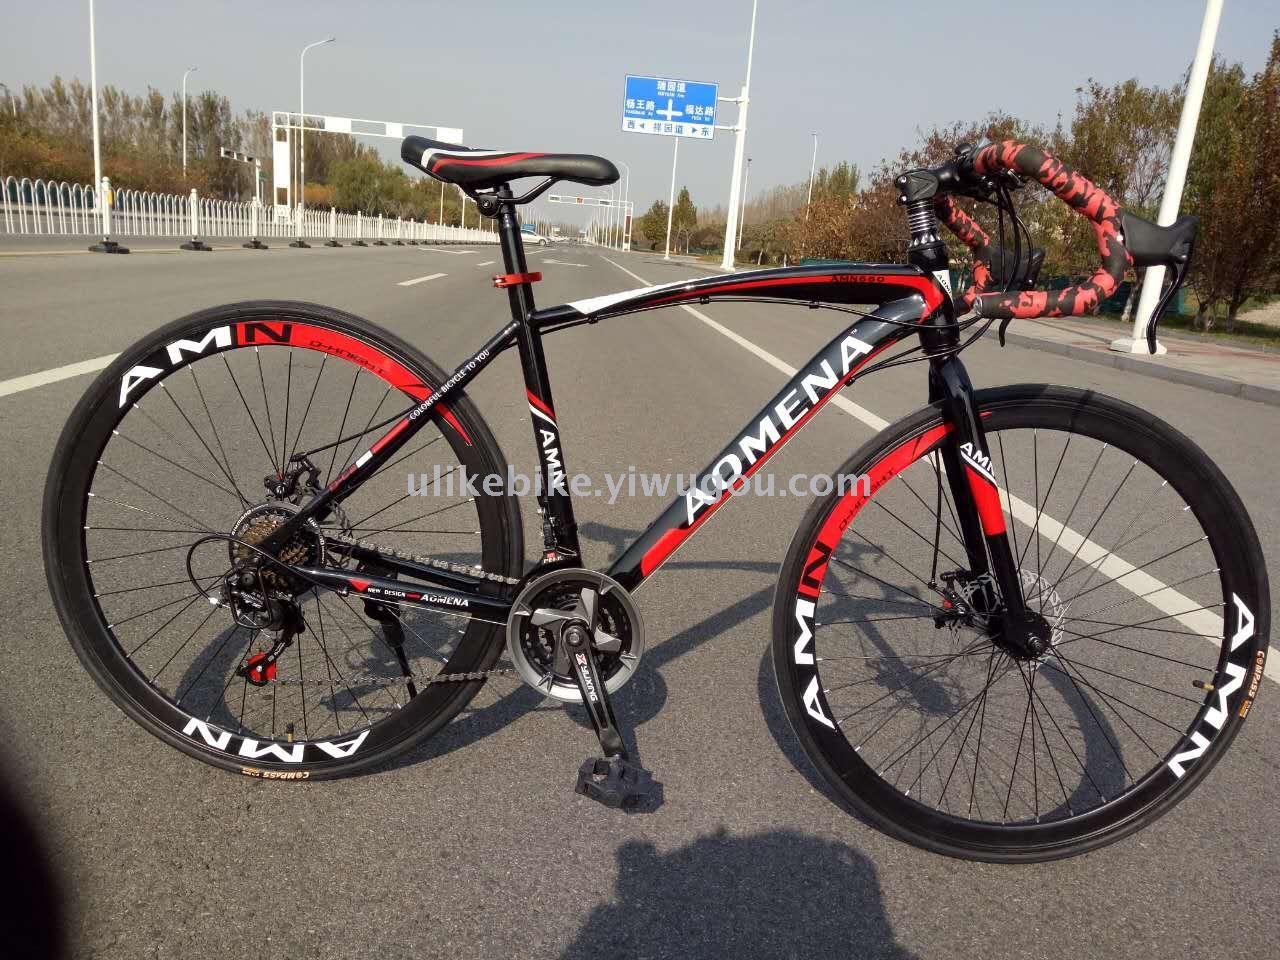 Supply Bike 26 21 Speed Mountain Bike Transmission High Carbon Steel Mountain Bike Factory Direct Selling